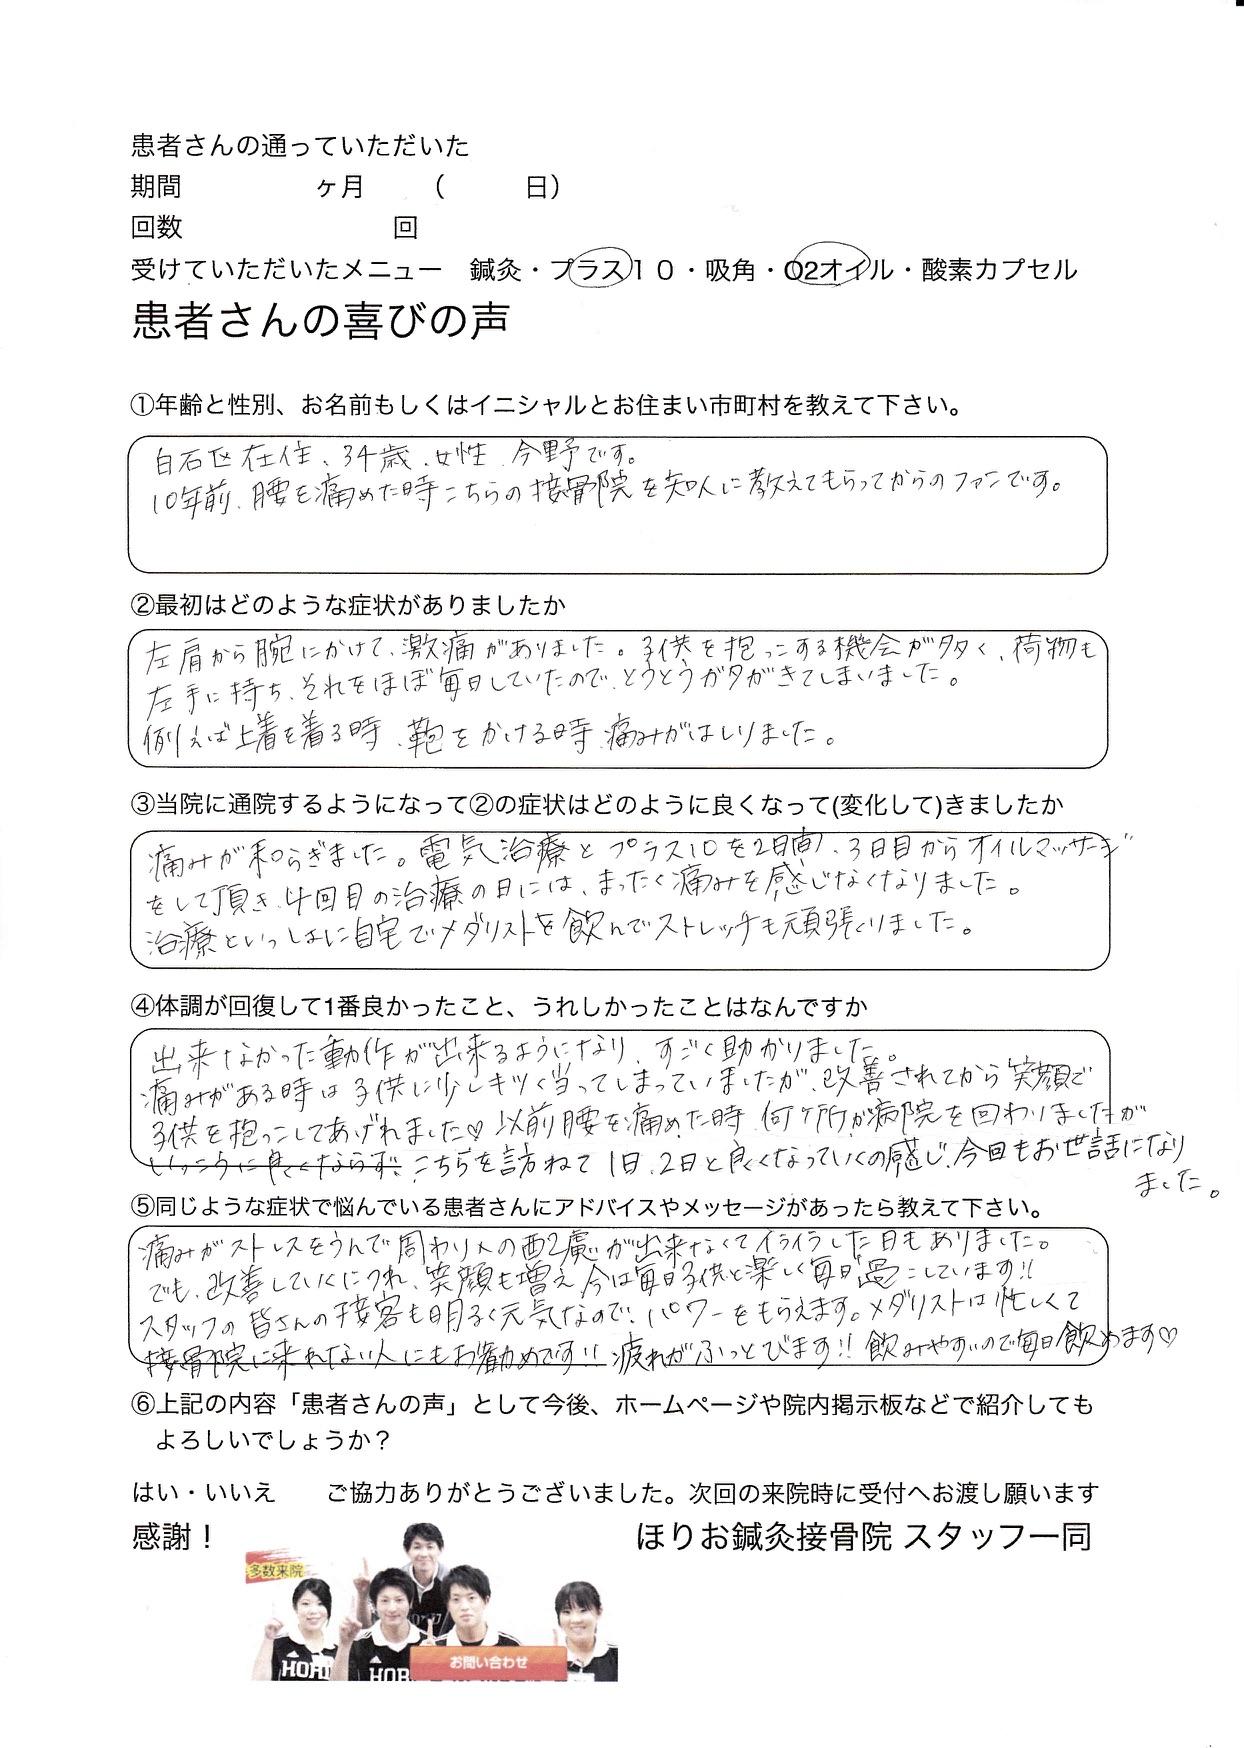 konnosamakoe.jpg